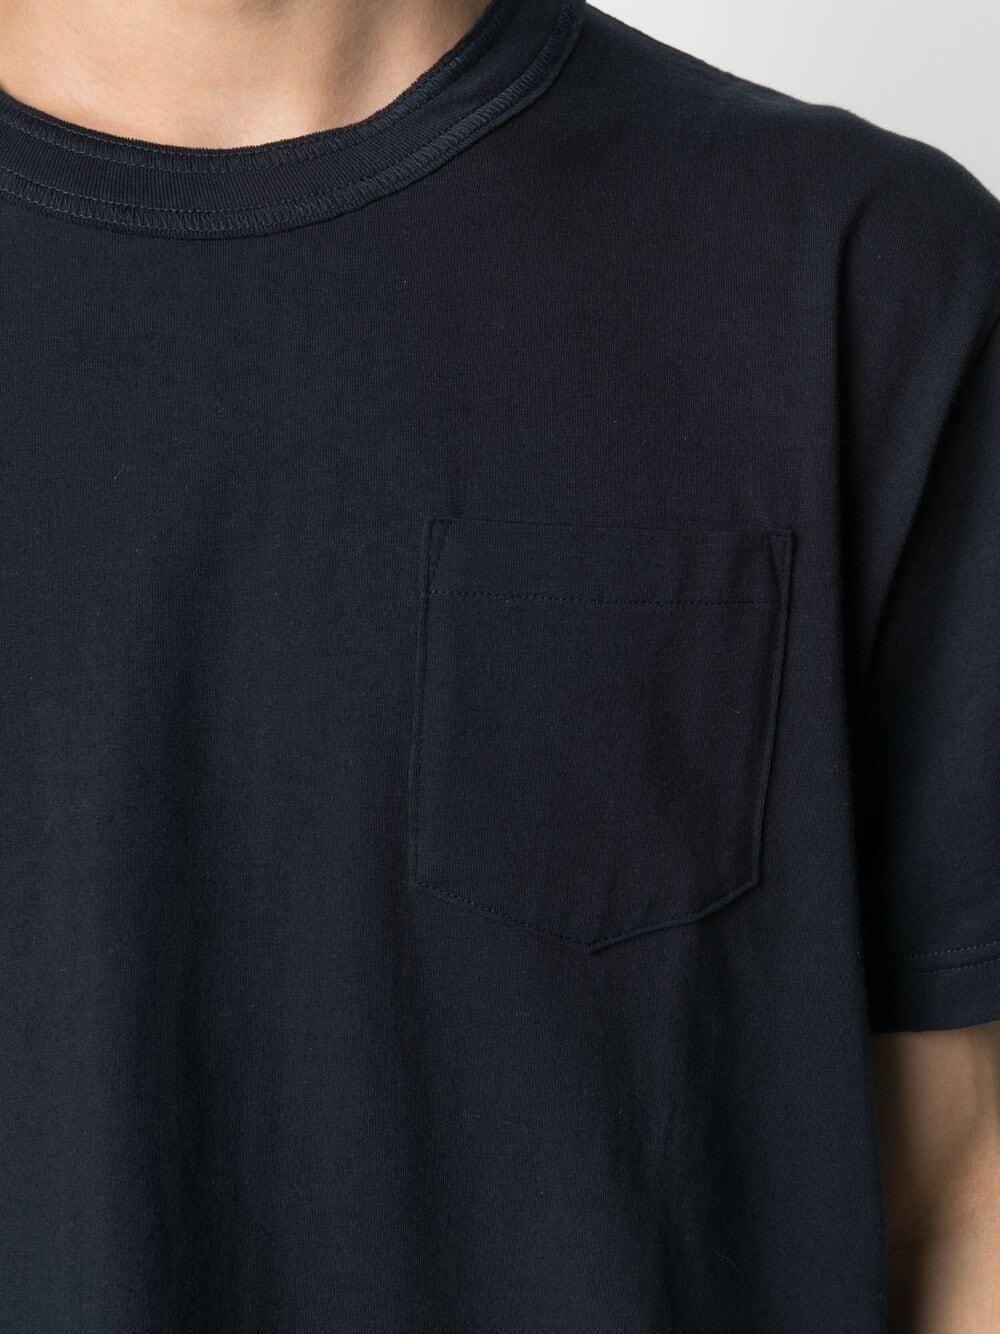 t-shirt con taschino uomo blu in cotone SACAI | T-shirt | SCM-034201